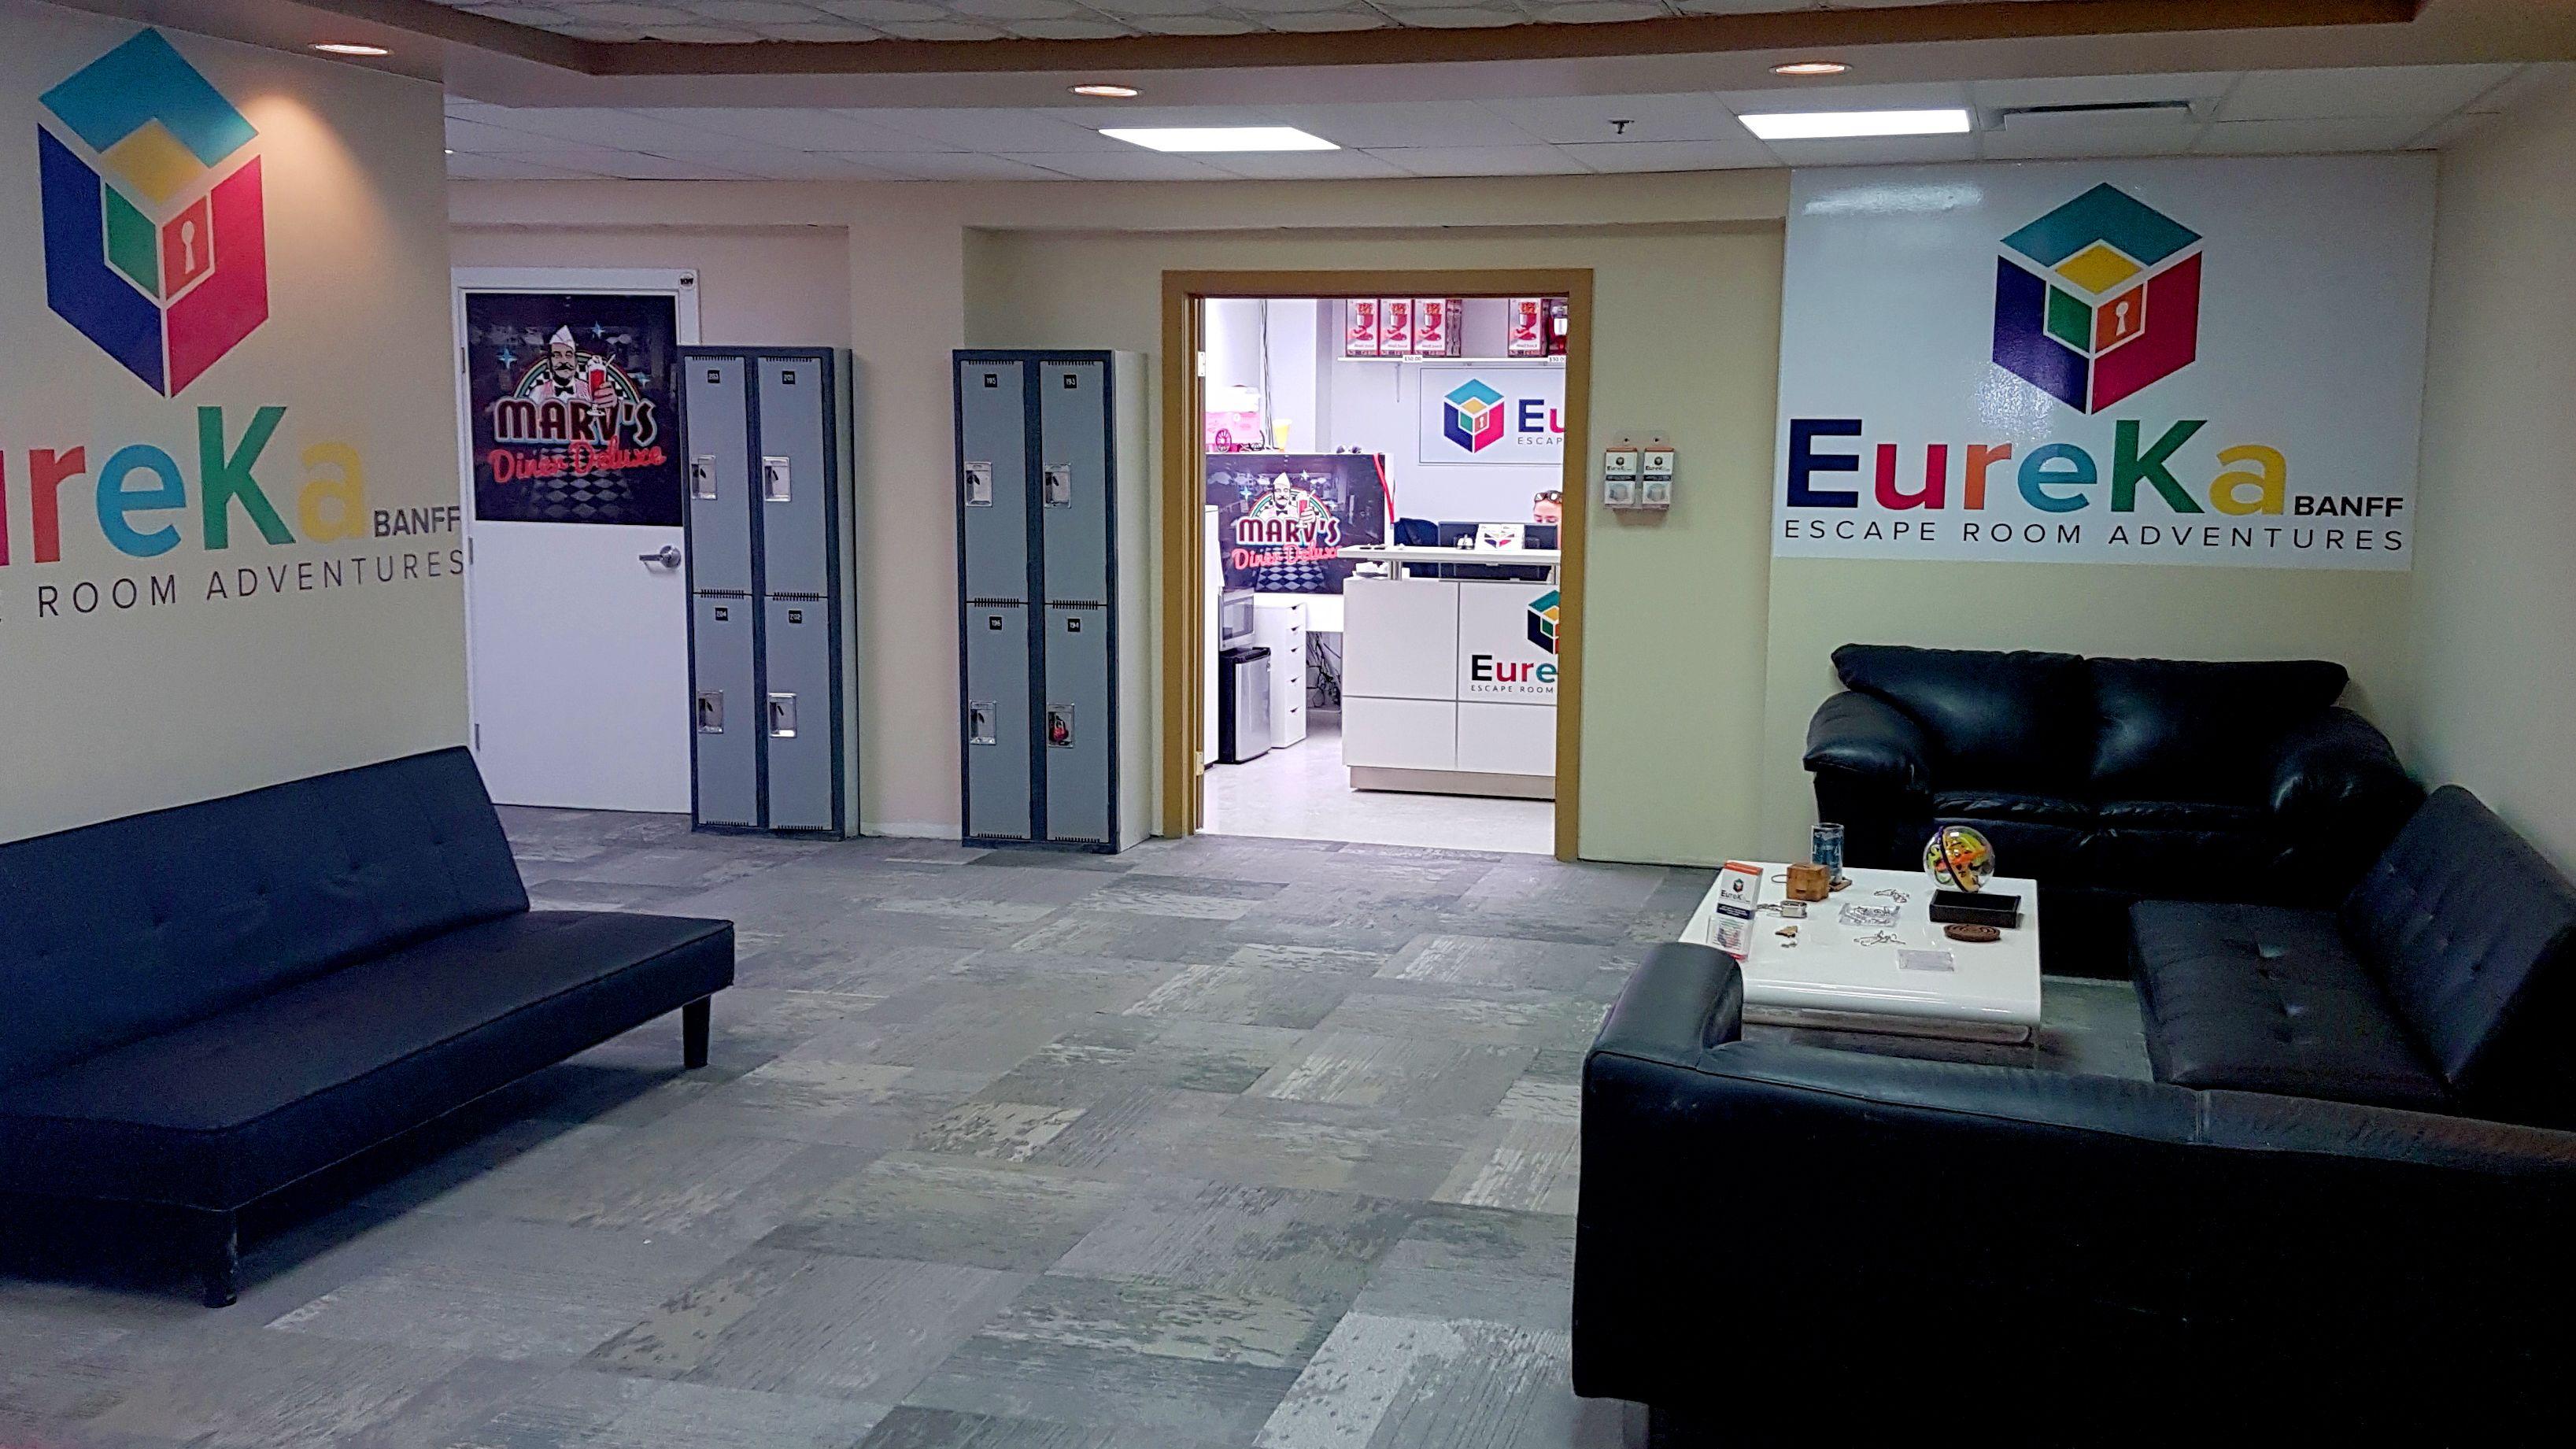 Eureka, Banff office